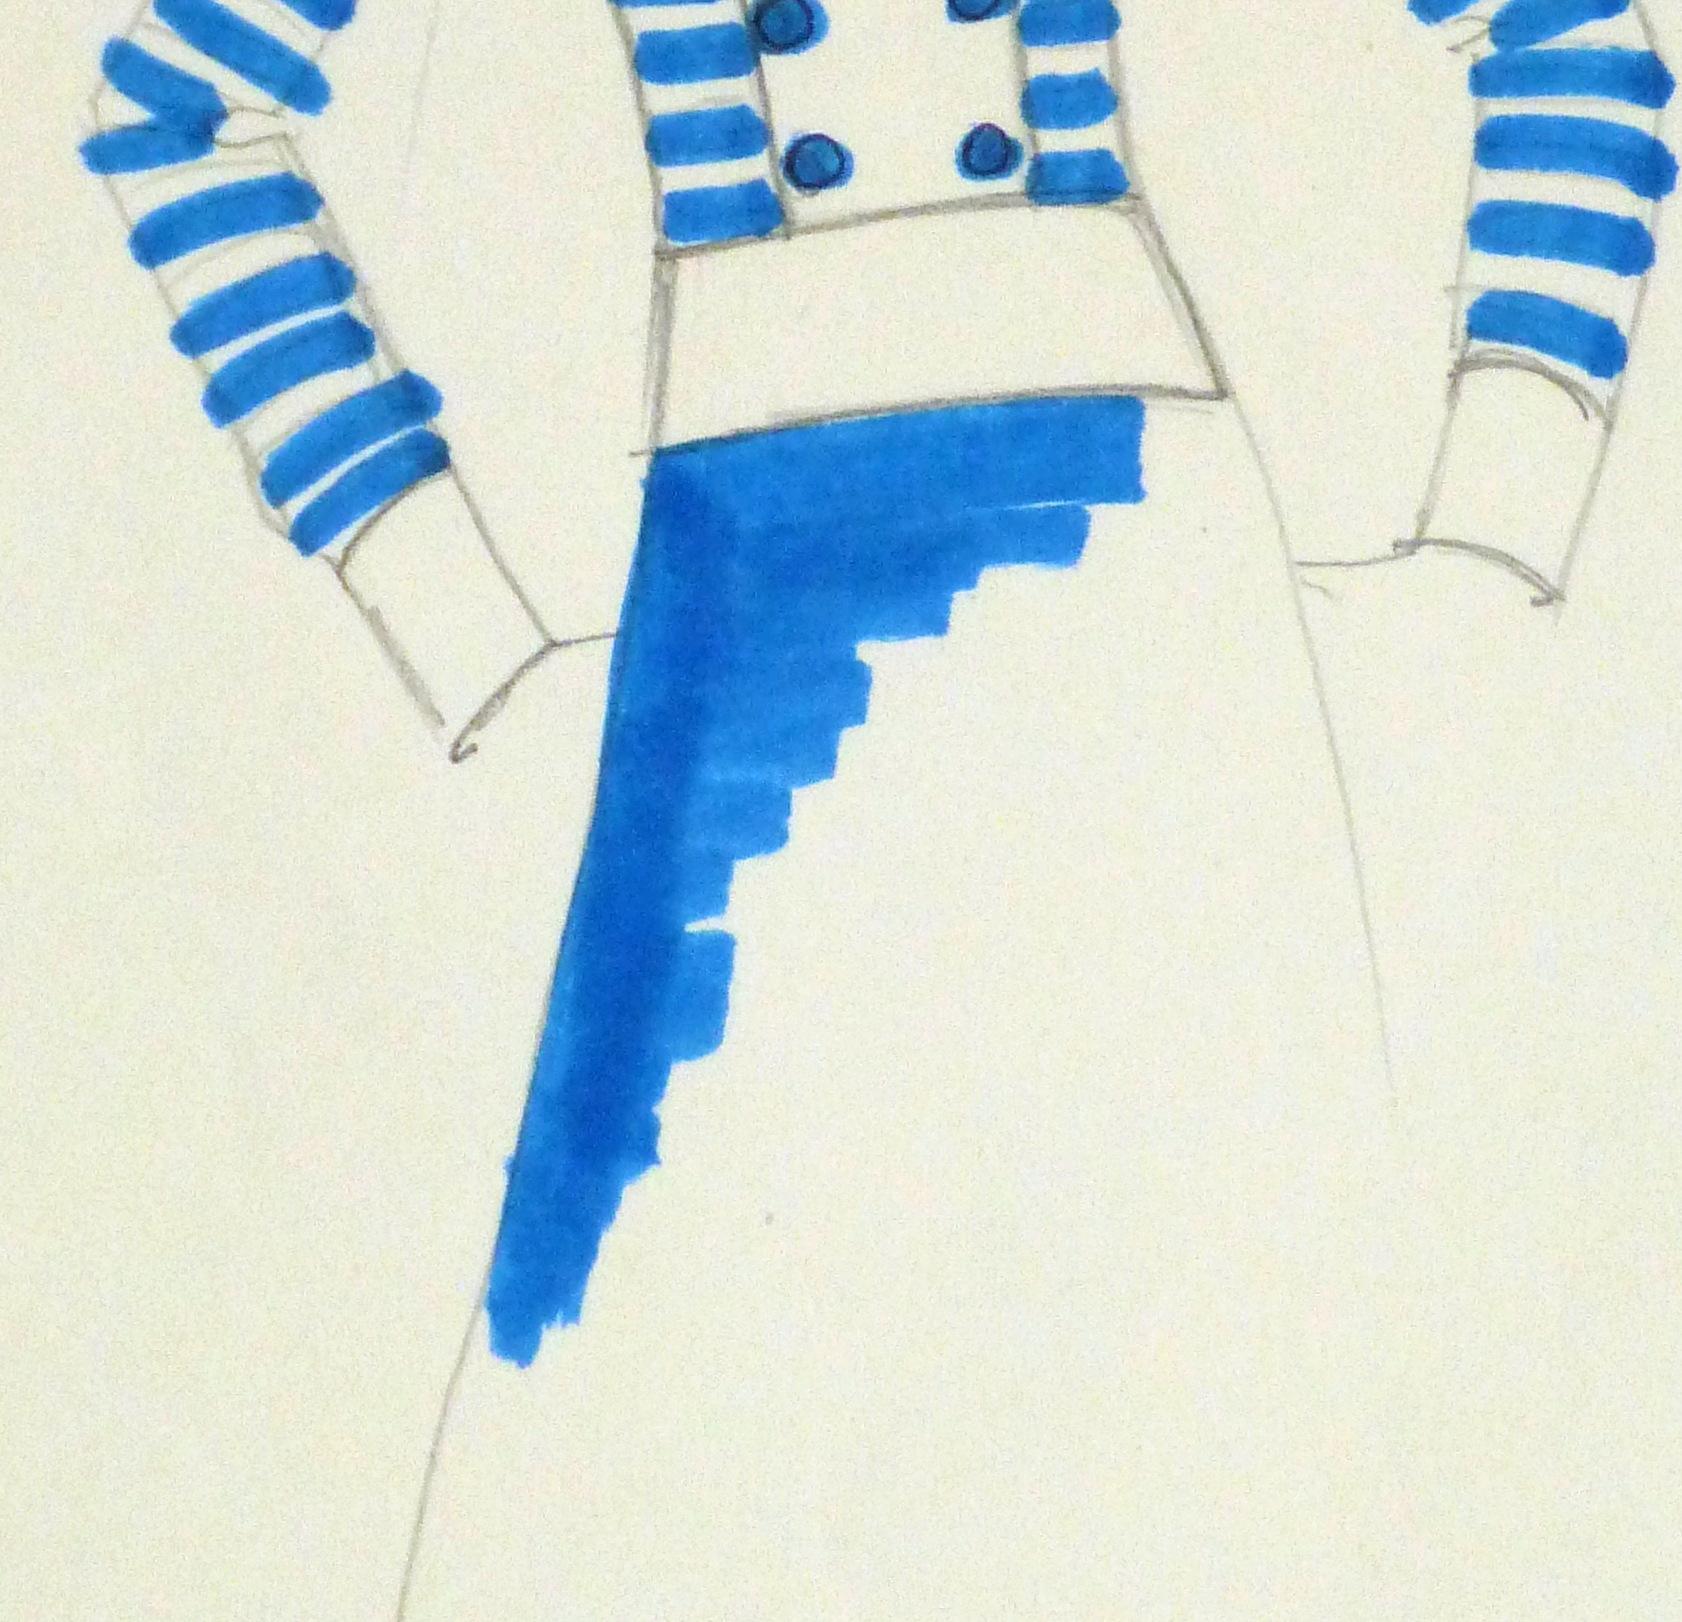 Ink & pencil Fashion Sketch - Blue Button - detail 2 -10109M